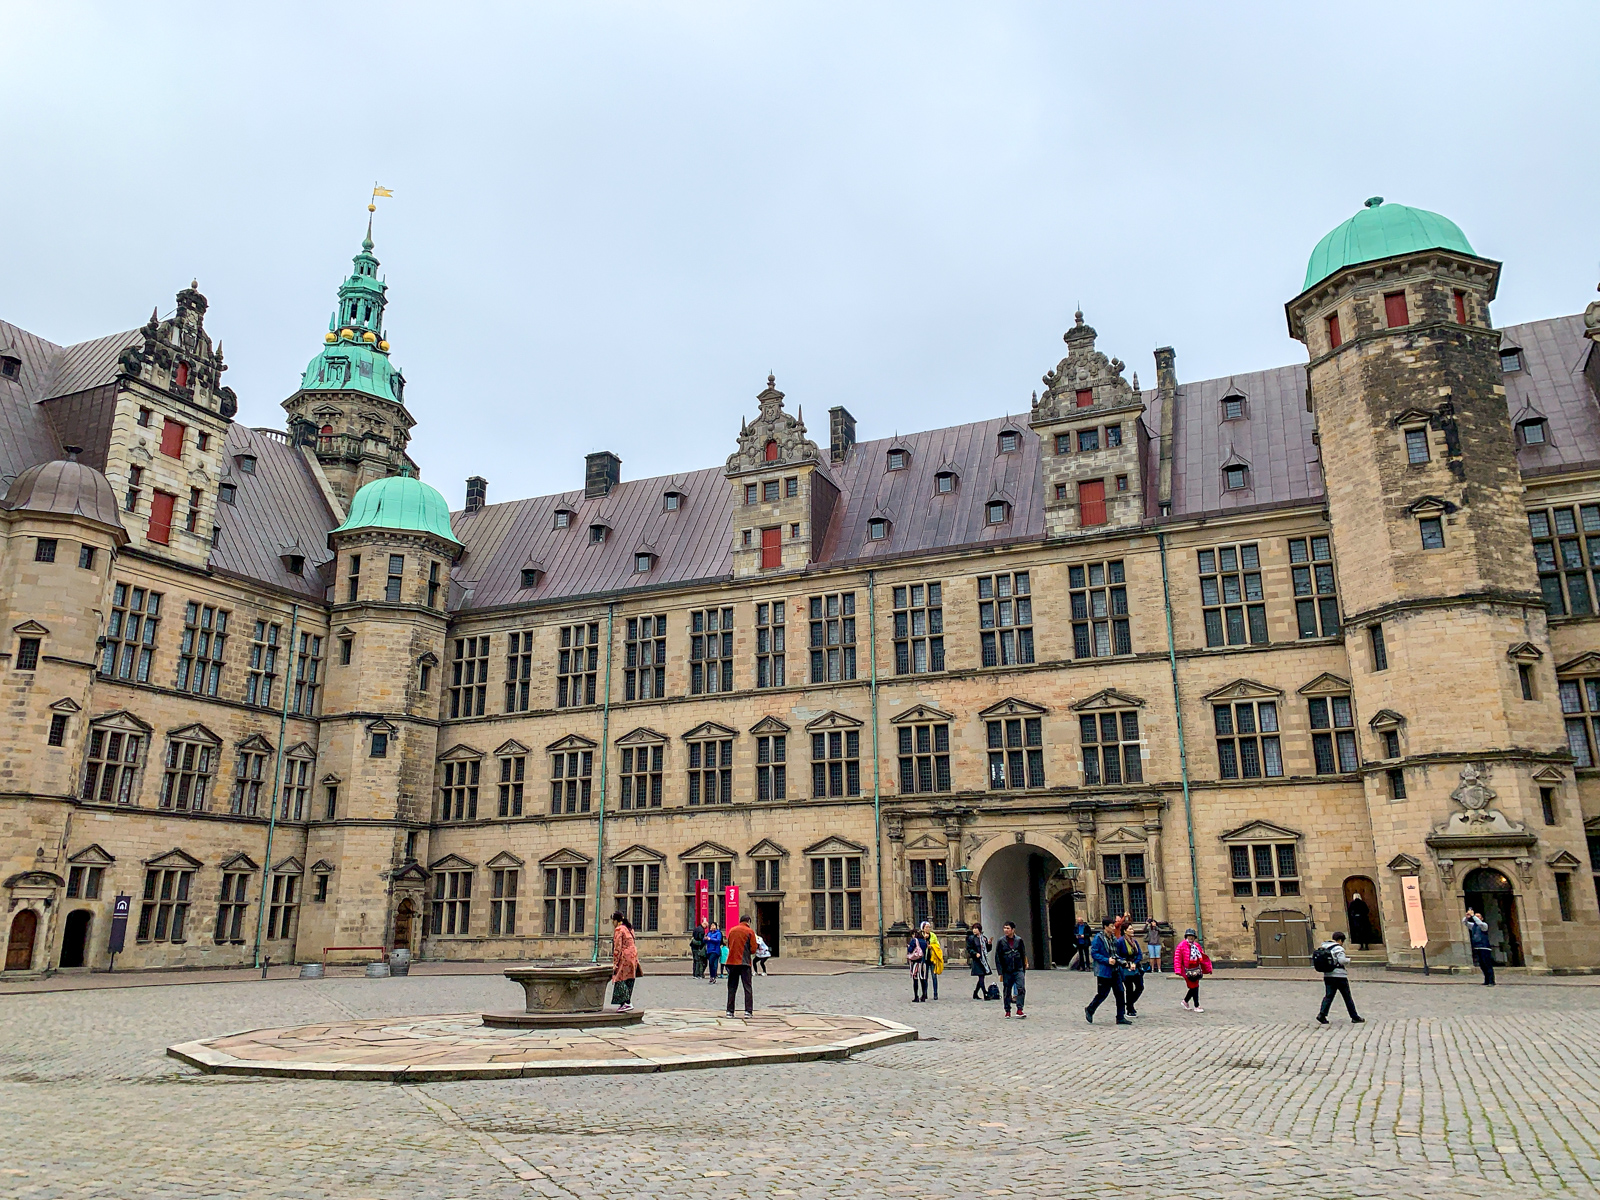 Courtyard at Kronborg Castle